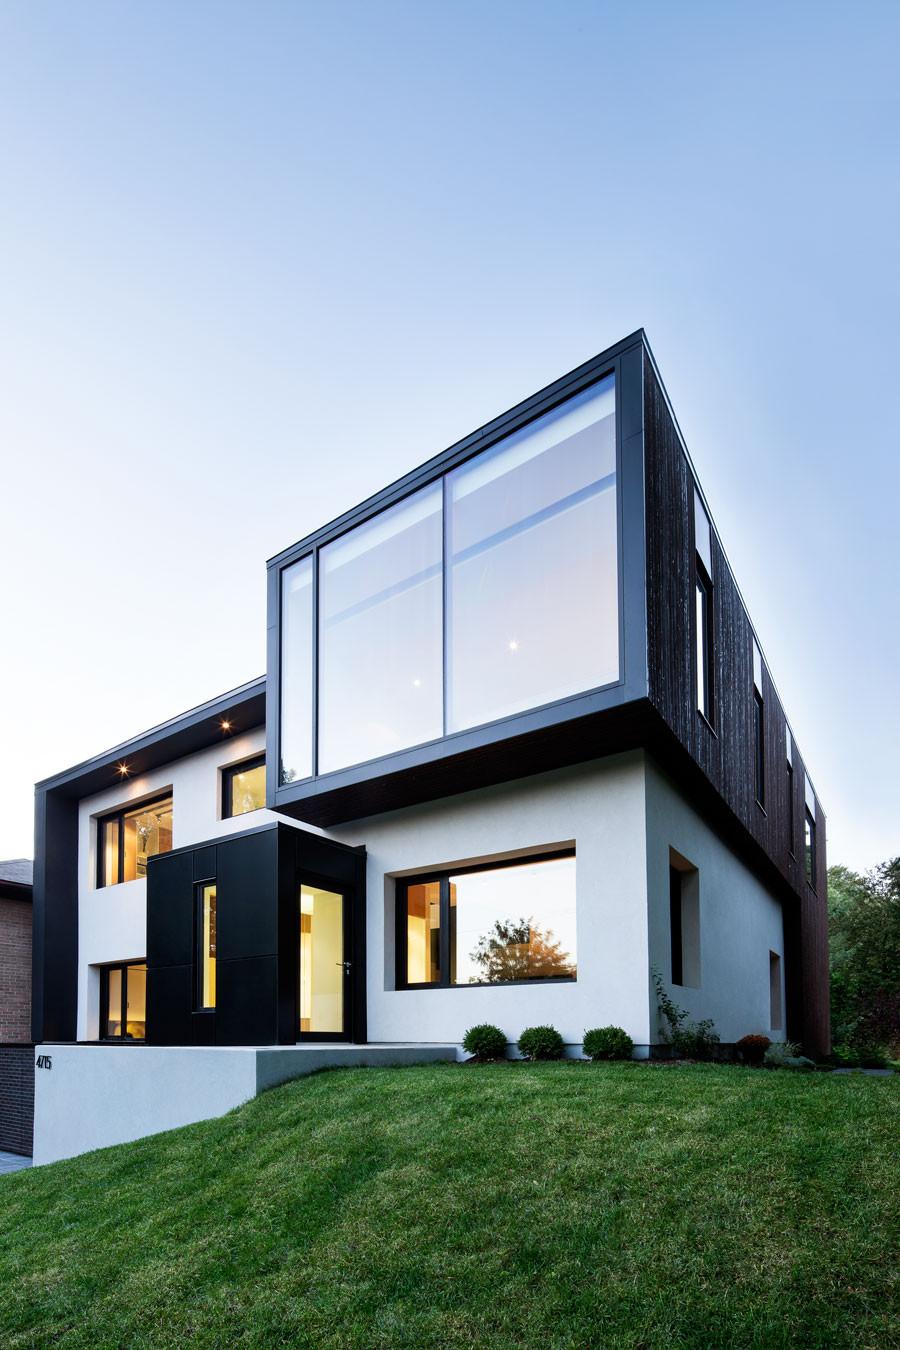 52328236e8e44e876600005f Connaught Residence Naturehumaine Photo on Modern House Exterior Design